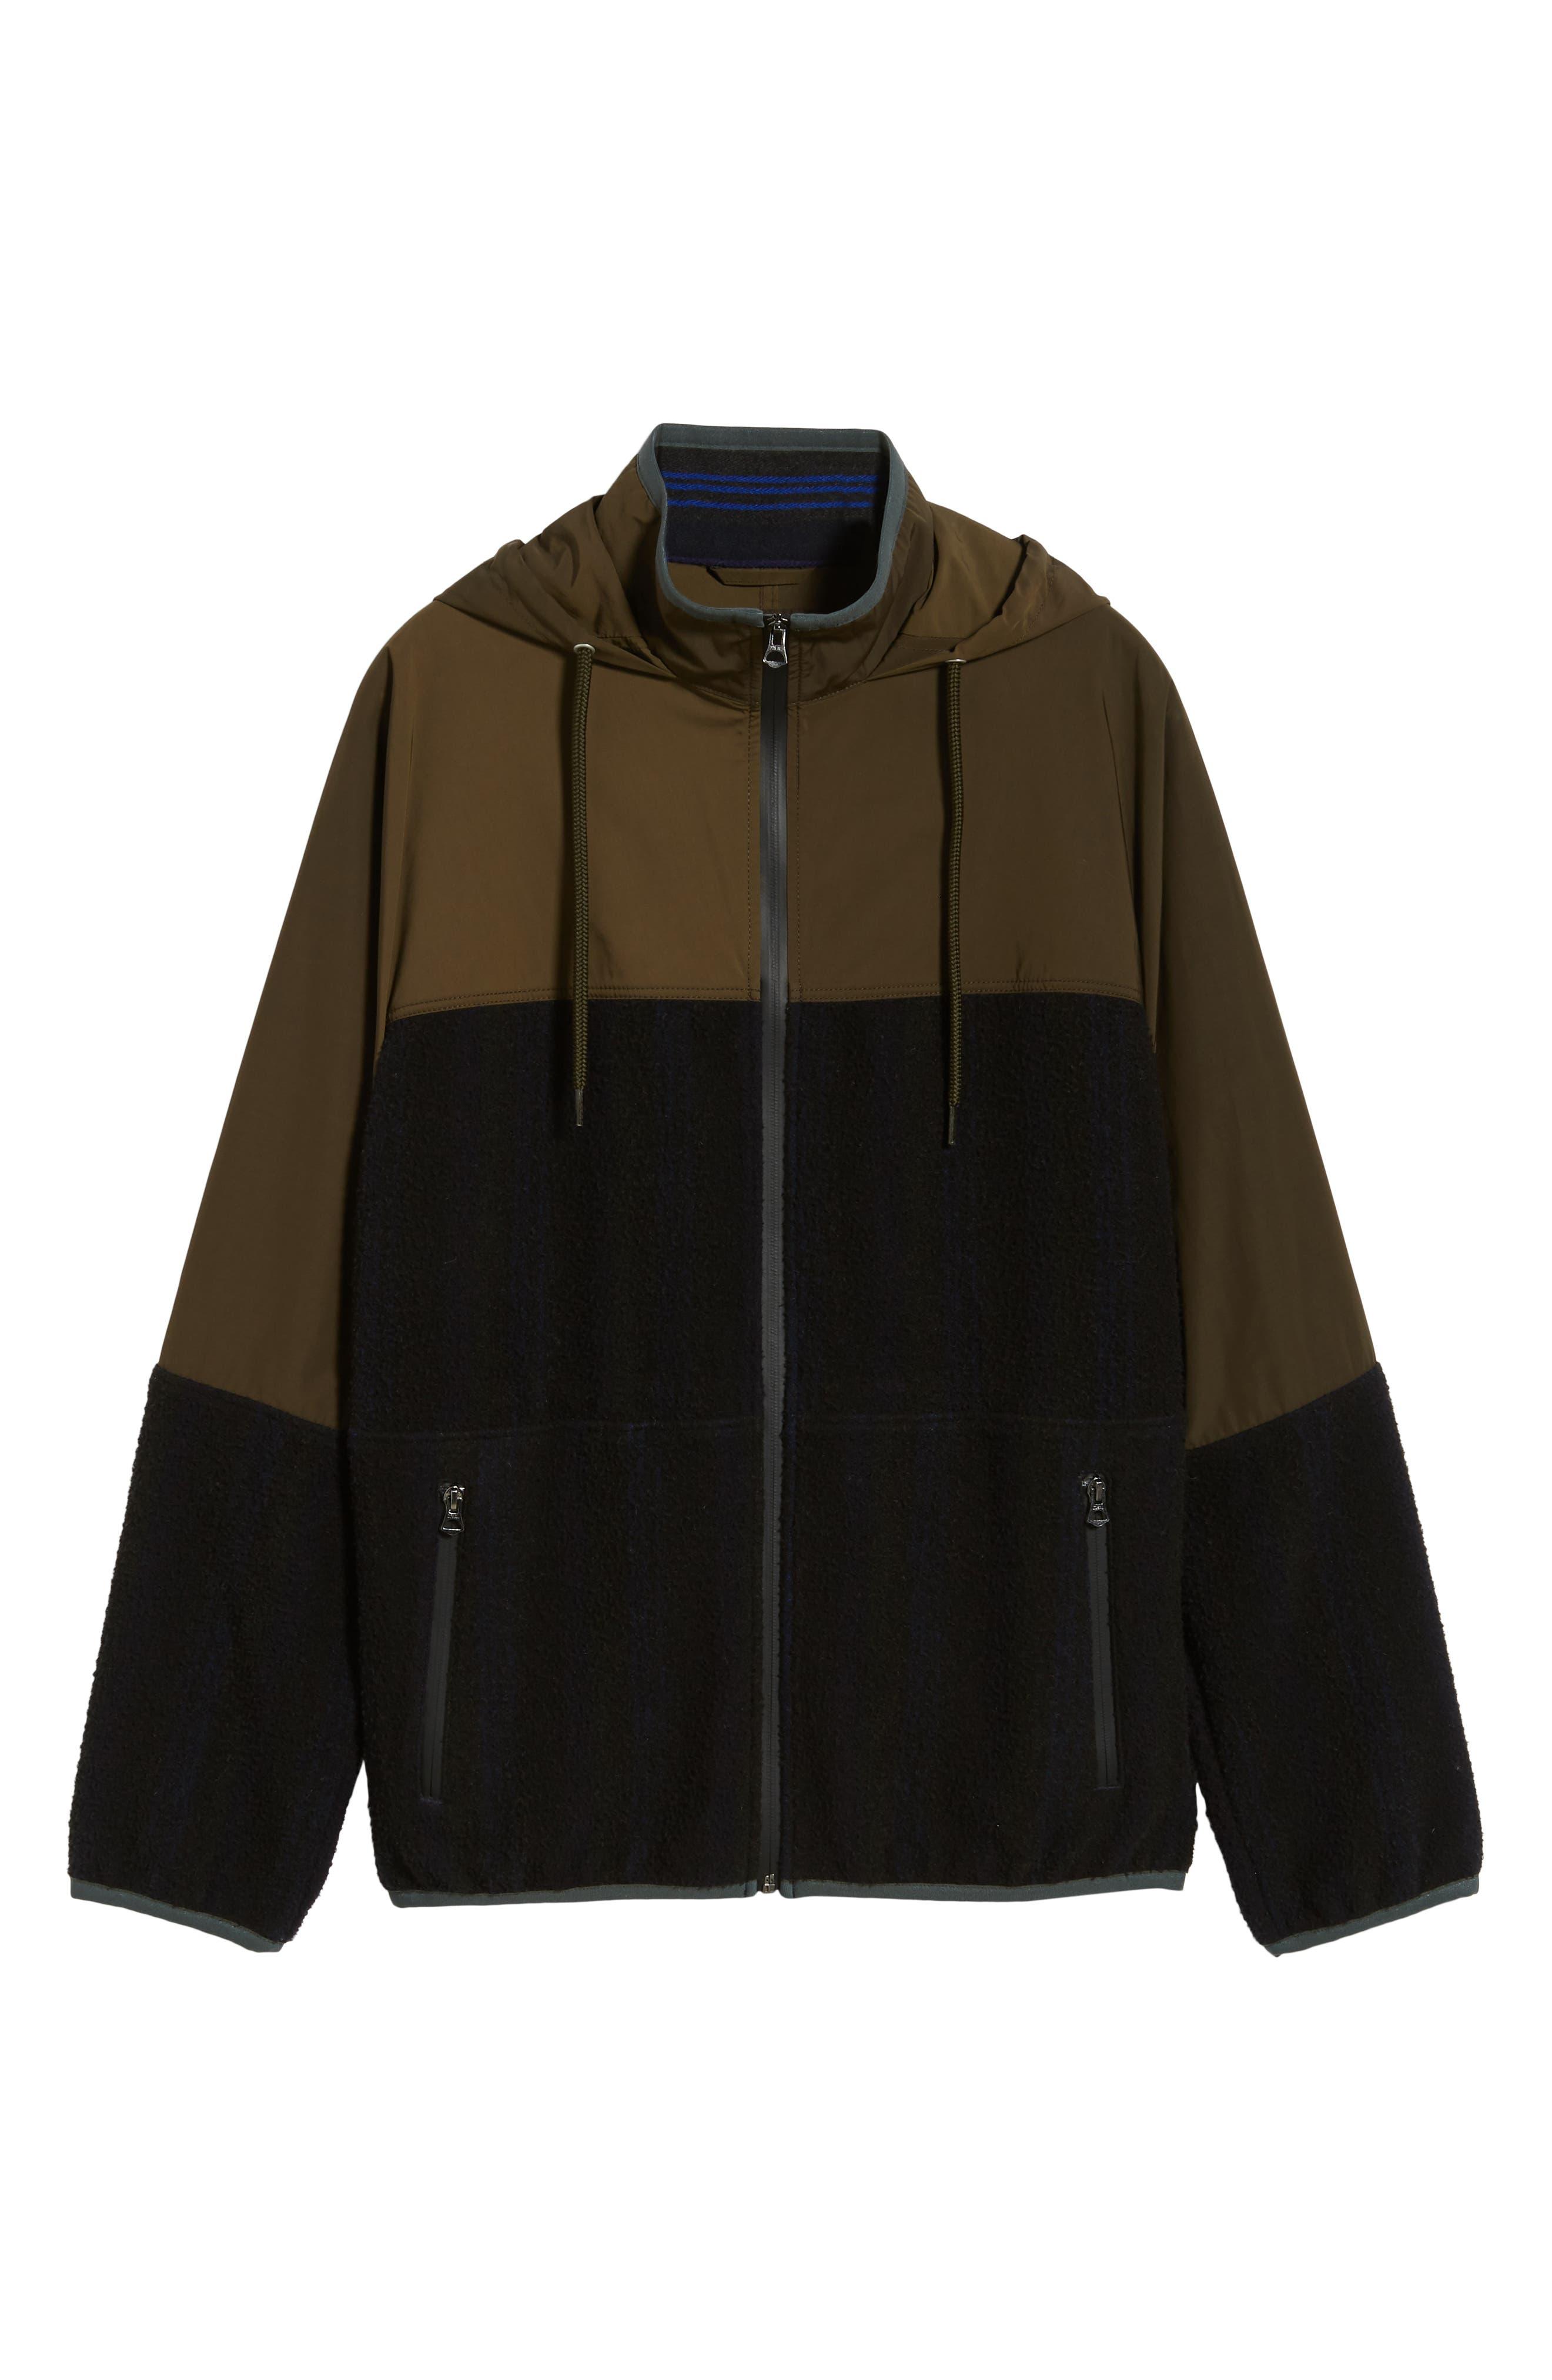 Mixed Media Hooded Jacket,                             Alternate thumbnail 5, color,                             FATIGUE